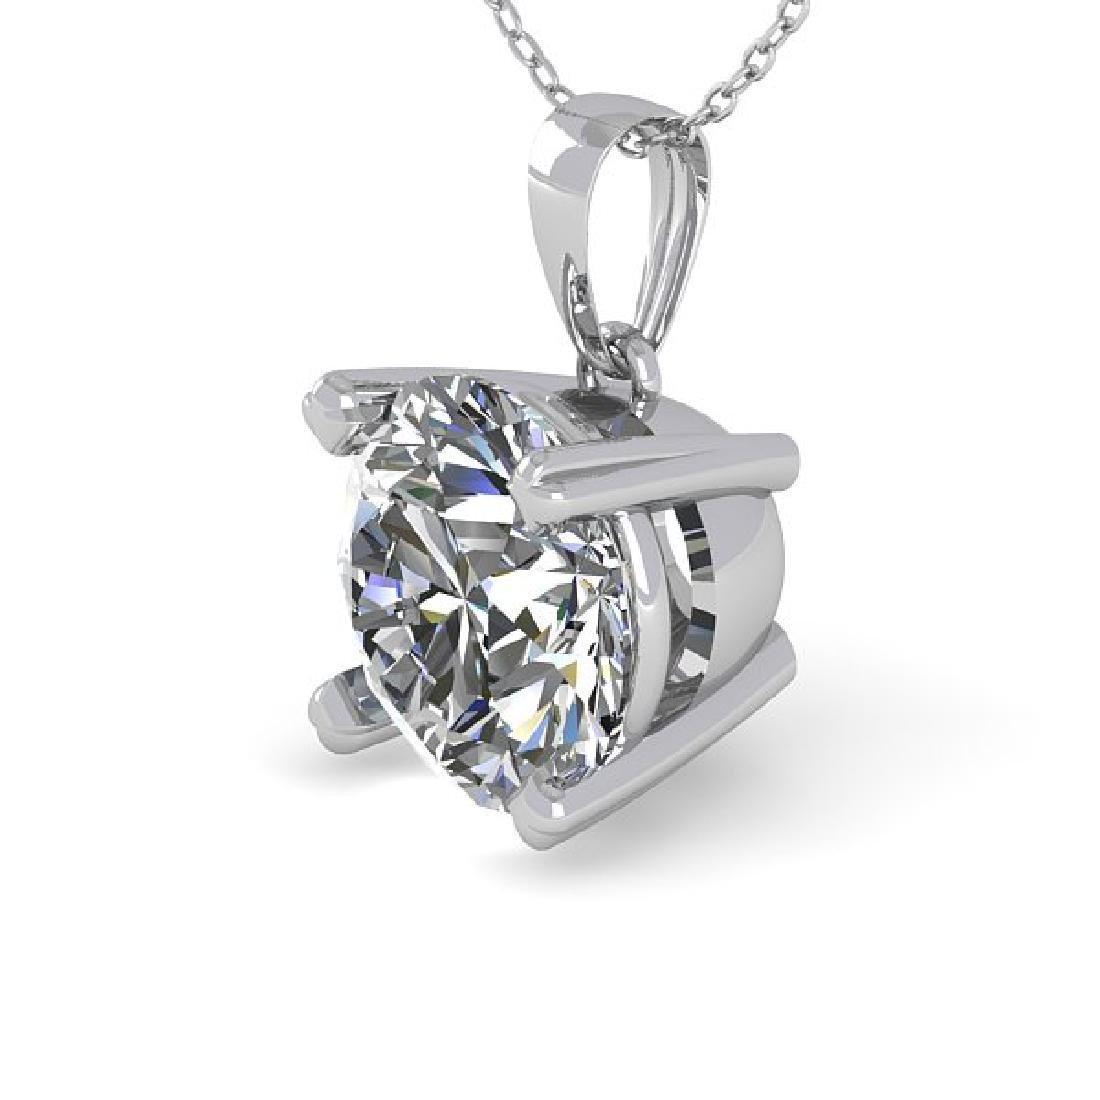 2 CTW Certified VS/SI Diamond Necklace 14K White Gold